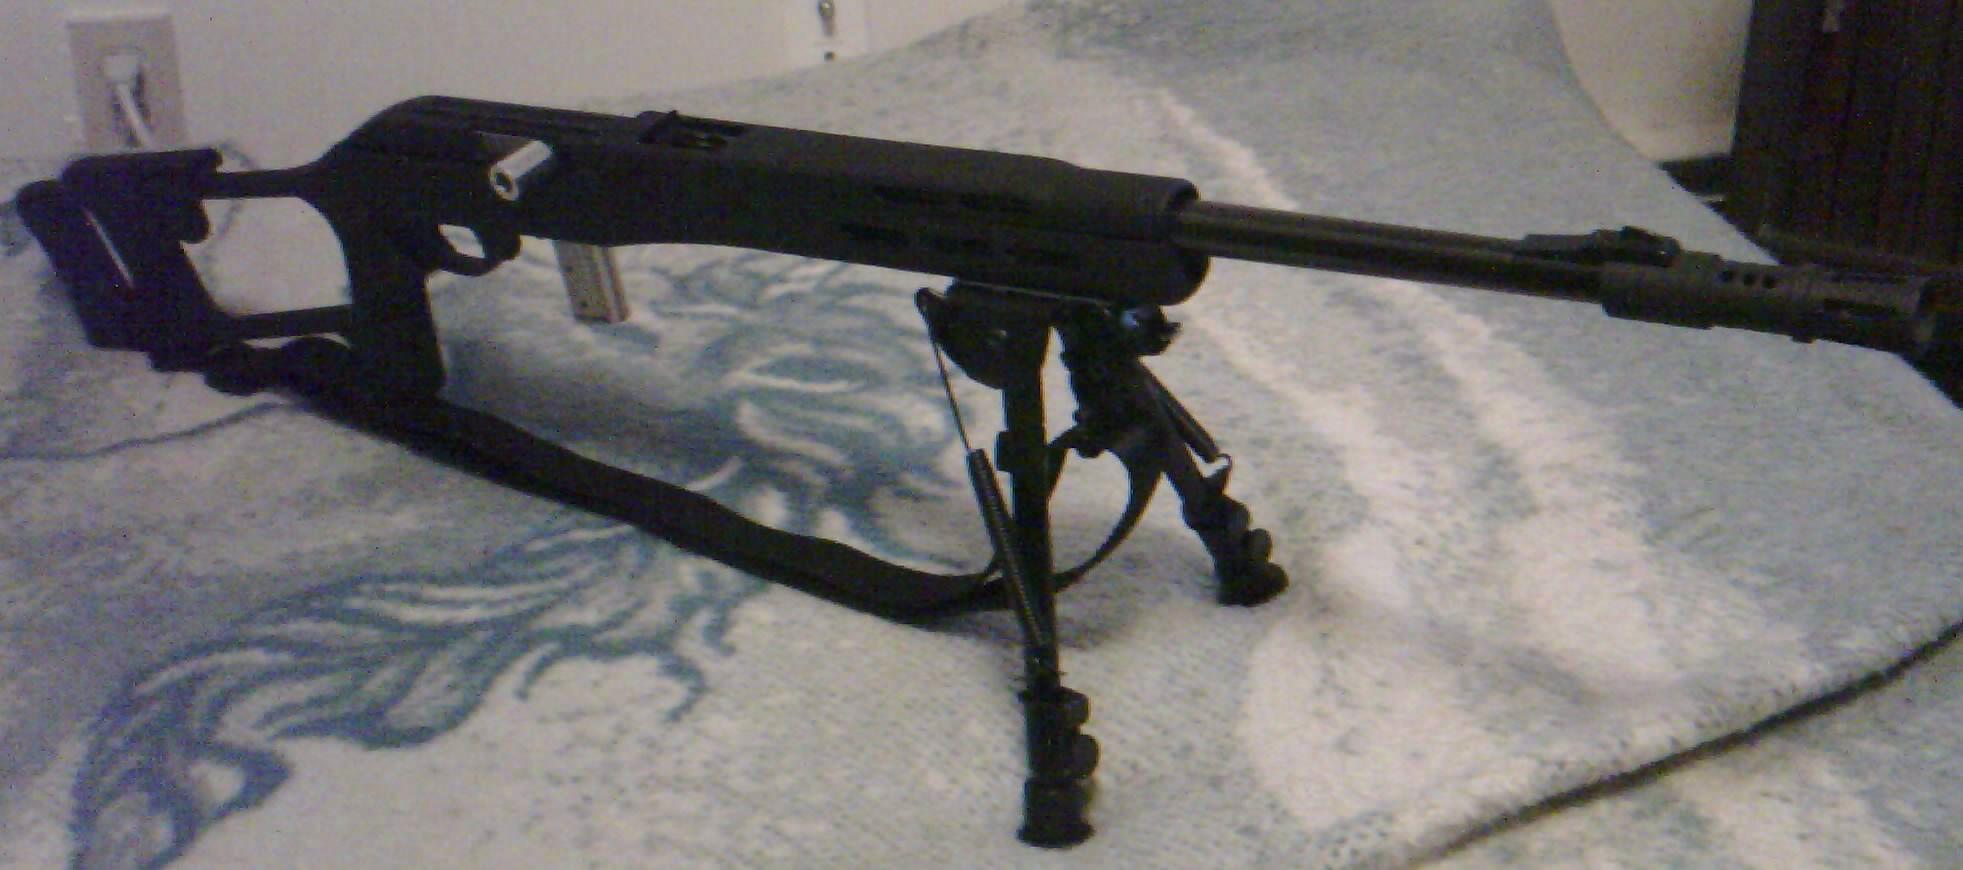 Marlin Model 60 Tactical Stock 34139 Loadtve